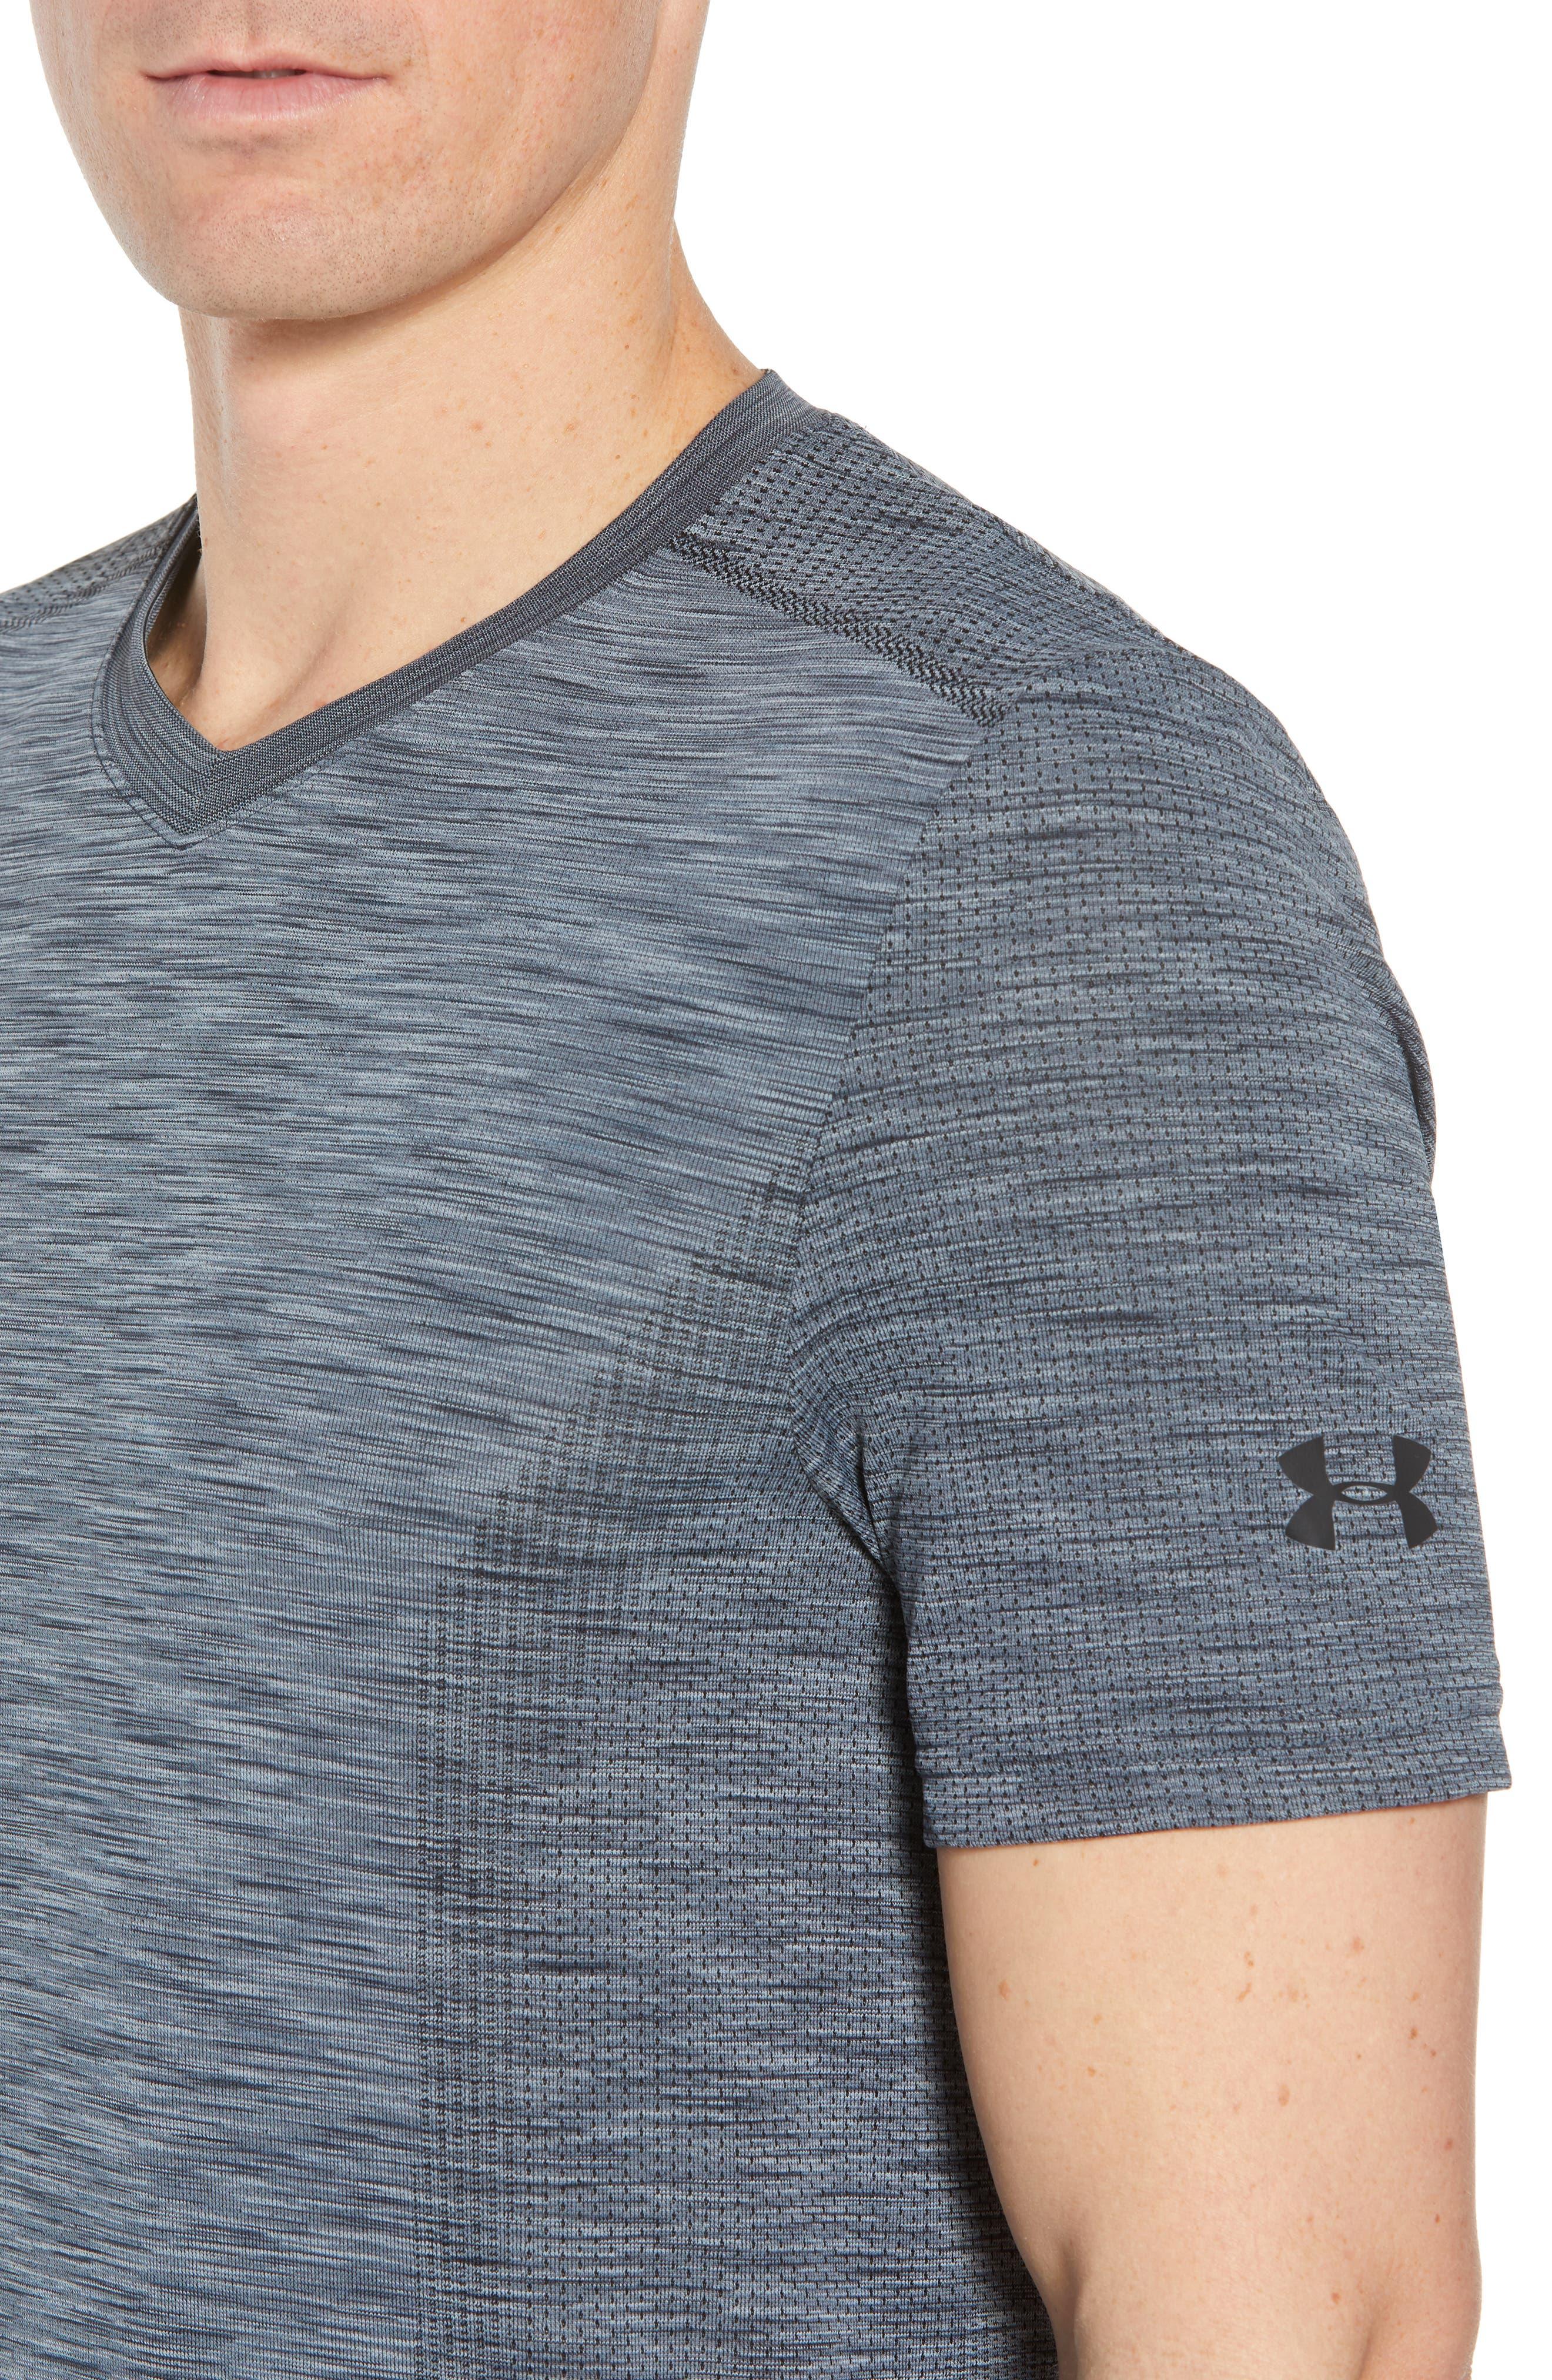 Regular Fit Threadborne T-Shirt,                             Alternate thumbnail 4, color,                             GRAPHITE/ BLACK